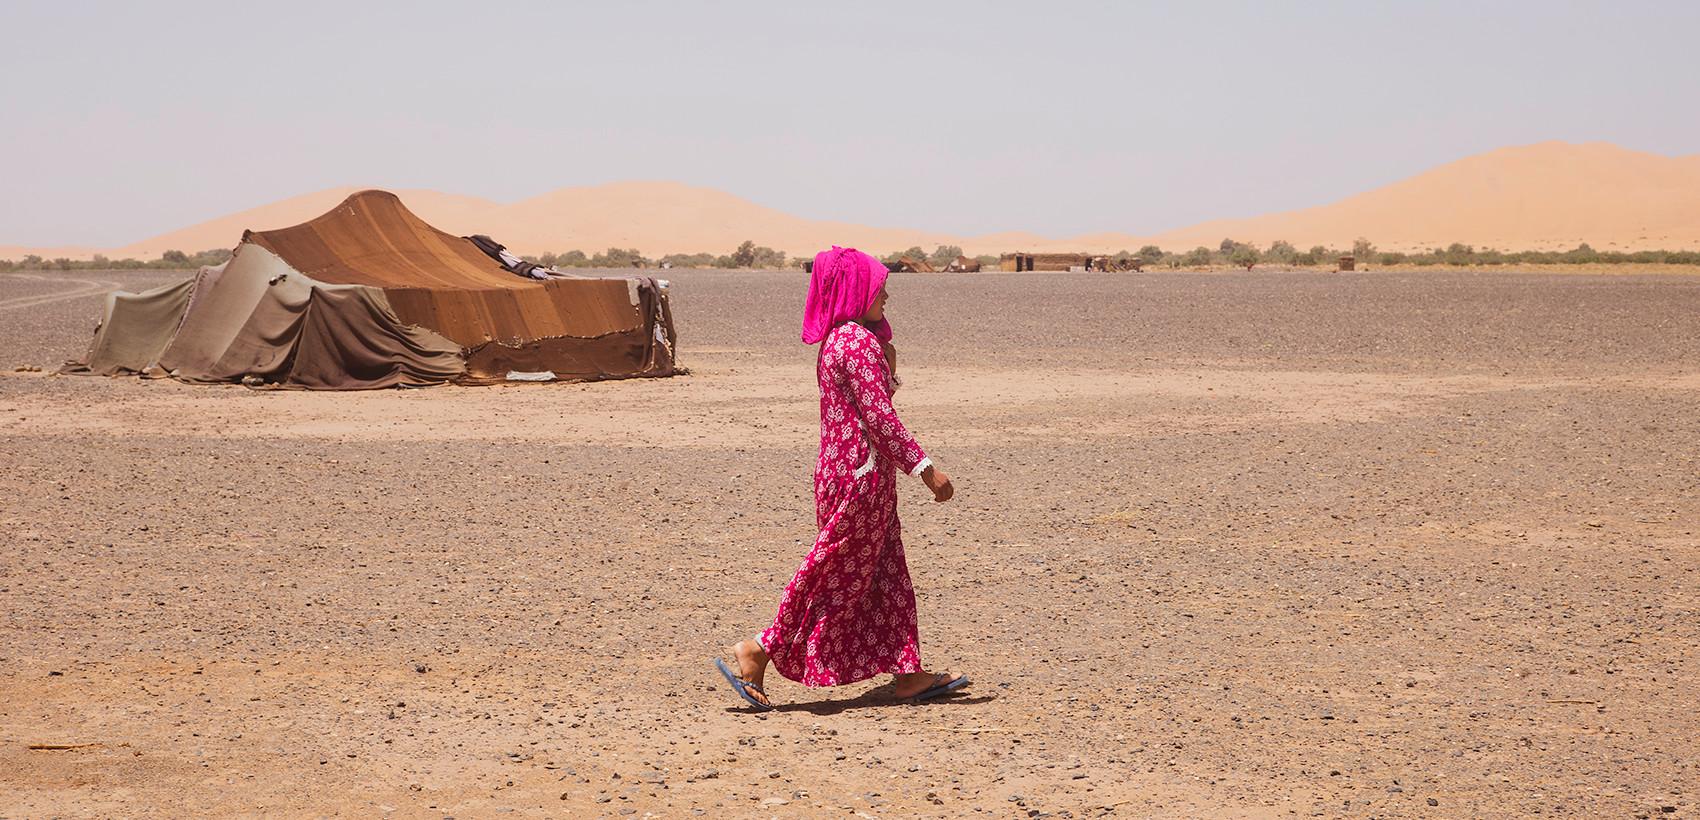 Born in the Sahara